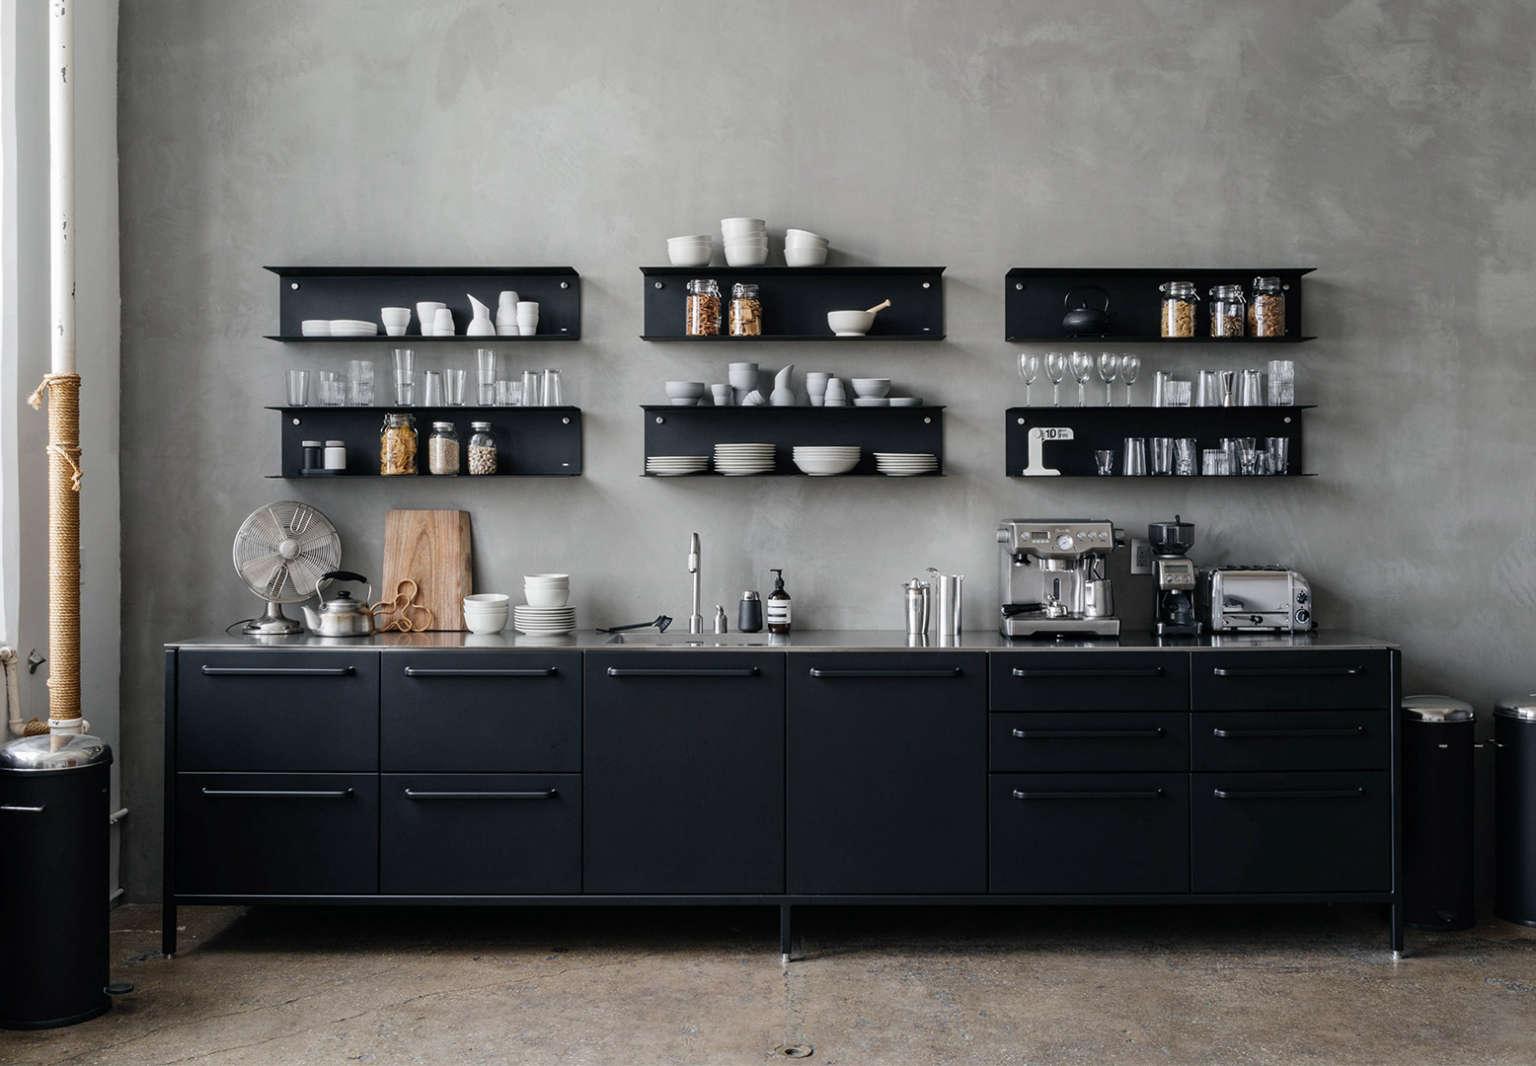 vipp soho office kitchen brand new school agency